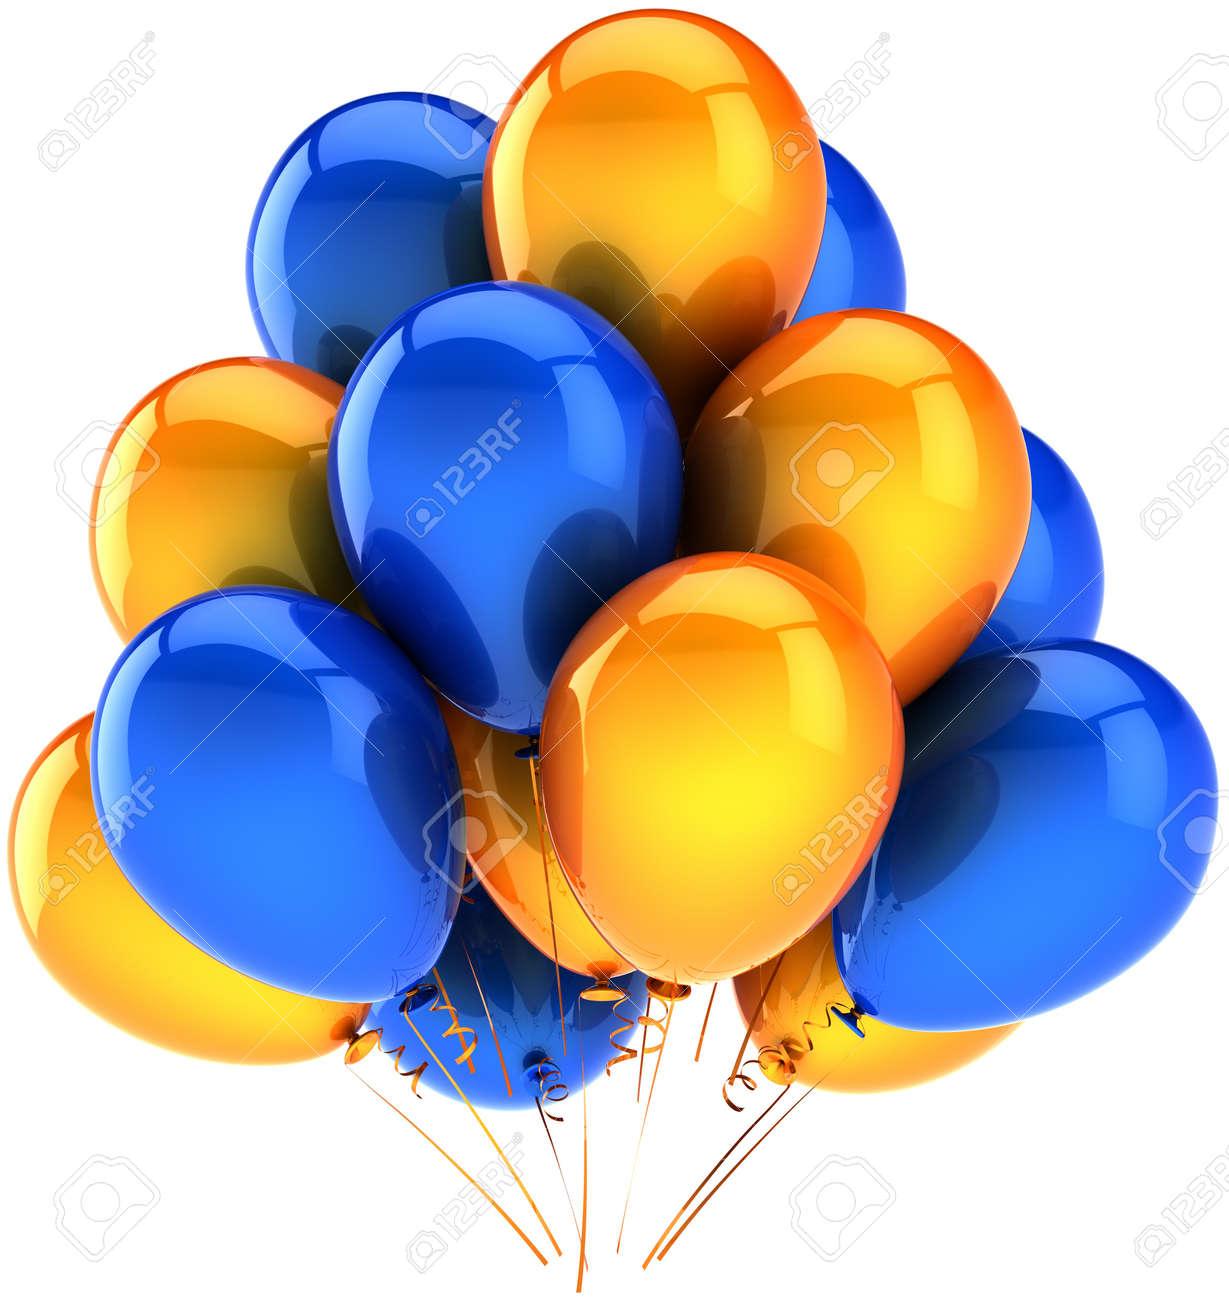 Party balloons multicolor blue orange. Beautiful shiny decoration for  birthday holiday celebration. Joyful happiness